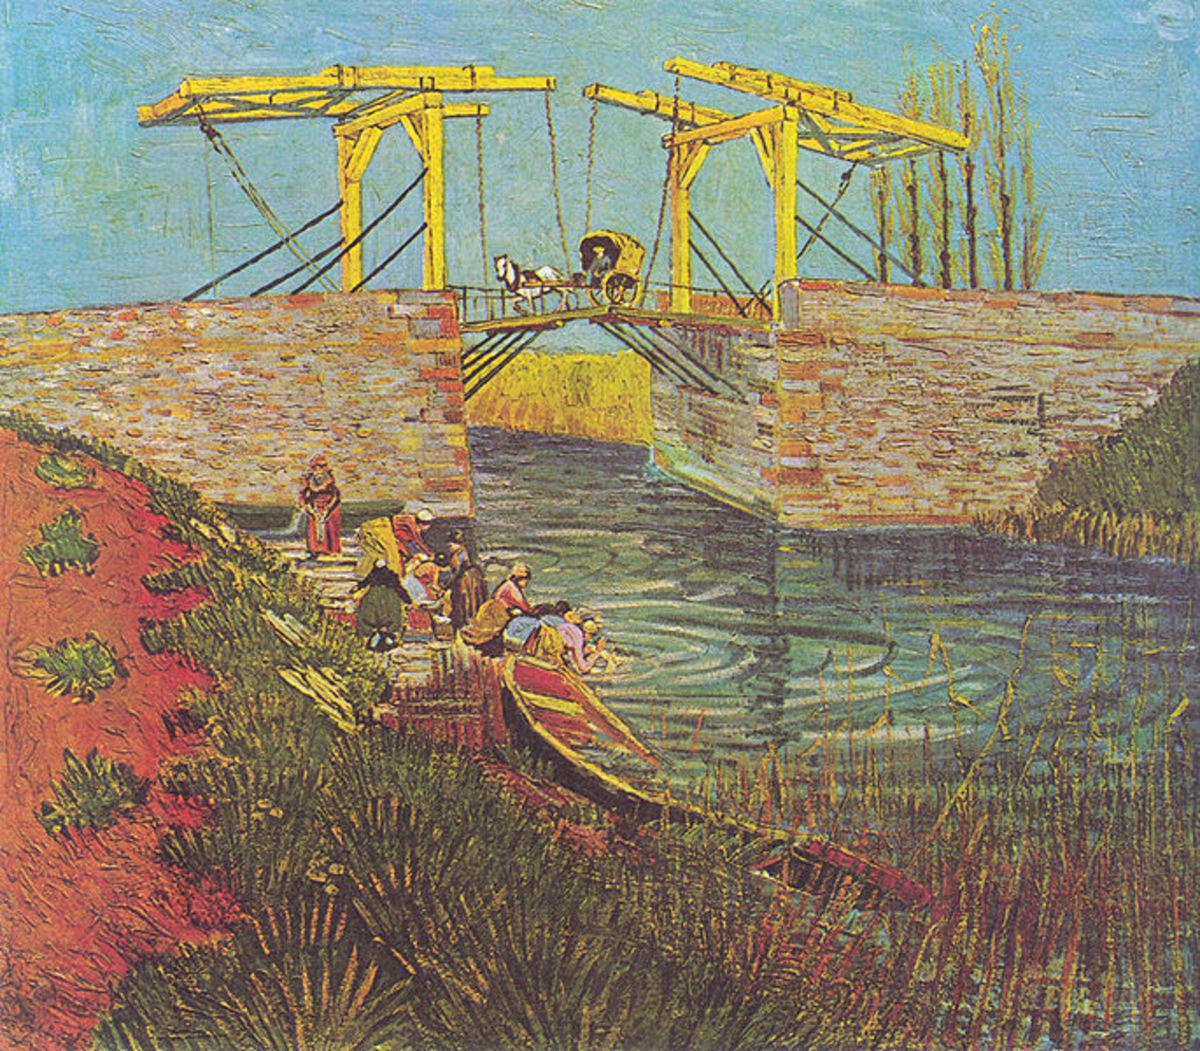 Le Pont de Langlois by Vincent Van Gogh, 1888. Image courtesy of Wiki Commons